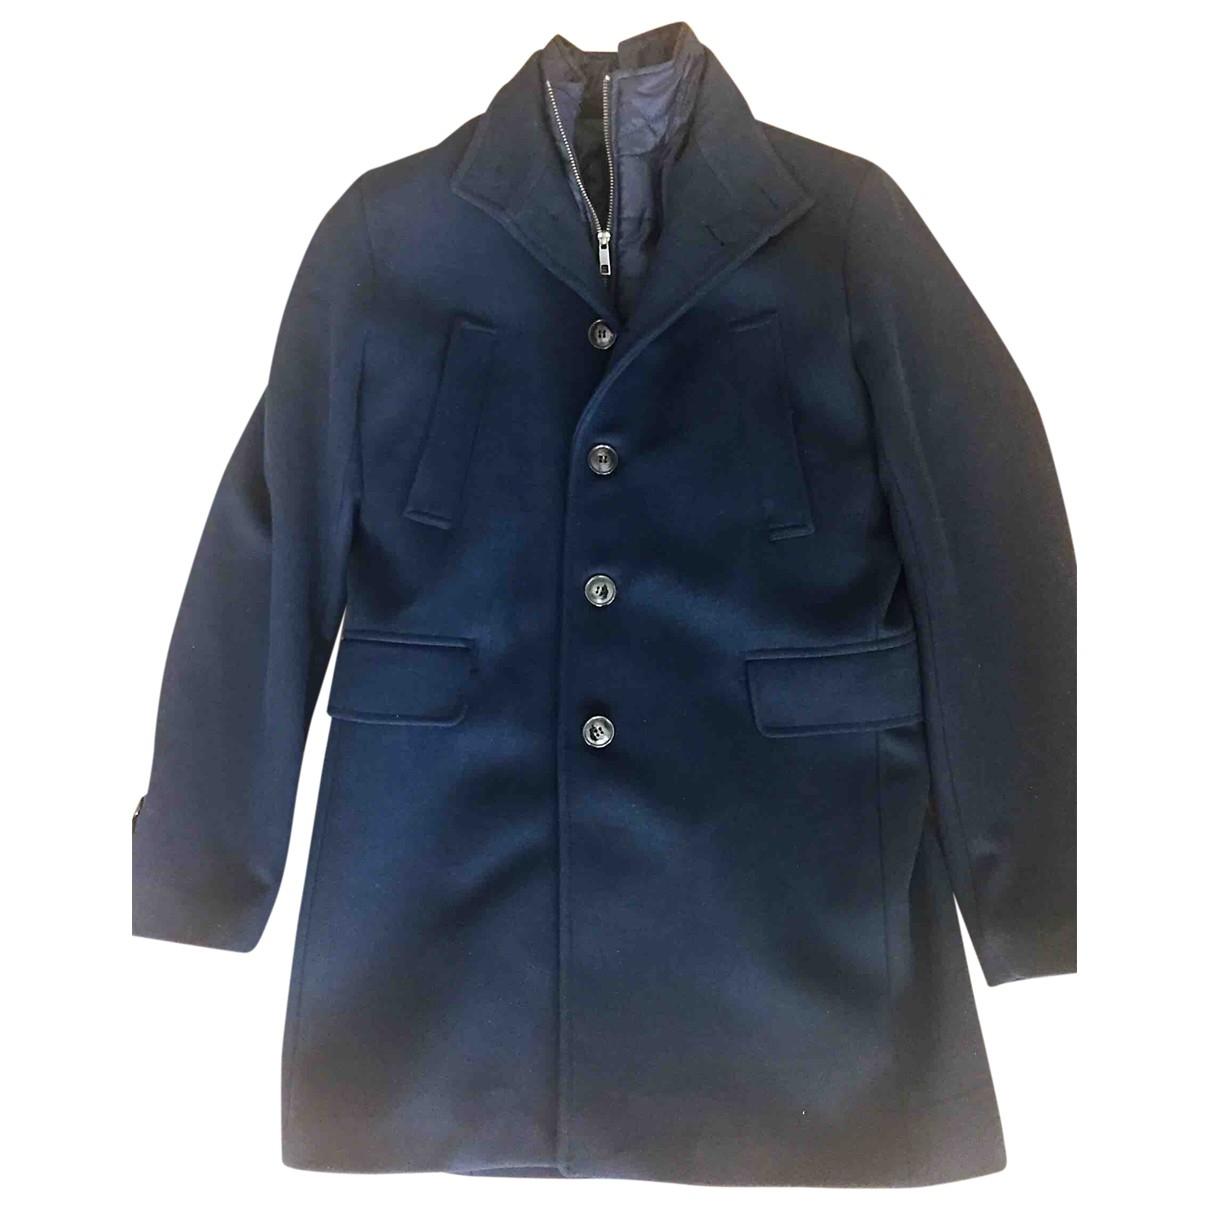 Zara - Manteau   pour homme - marine